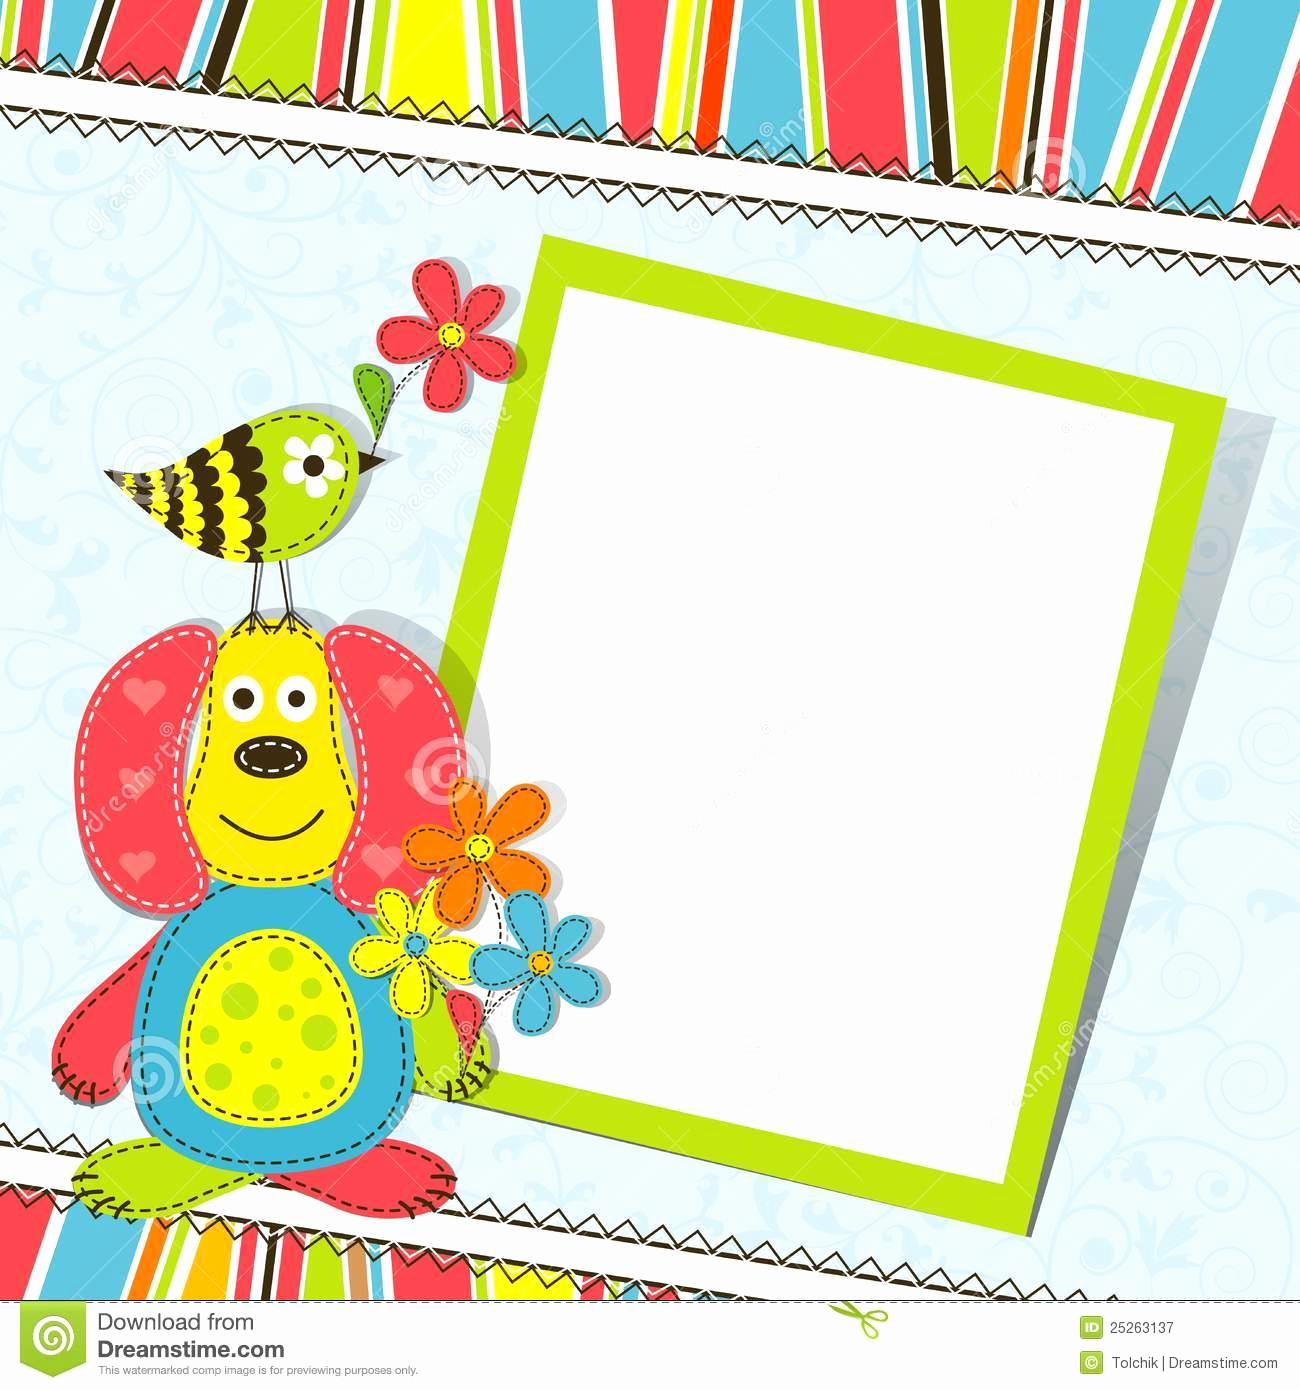 Printable Greeting Card Templates Beautiful Greeting Card Template